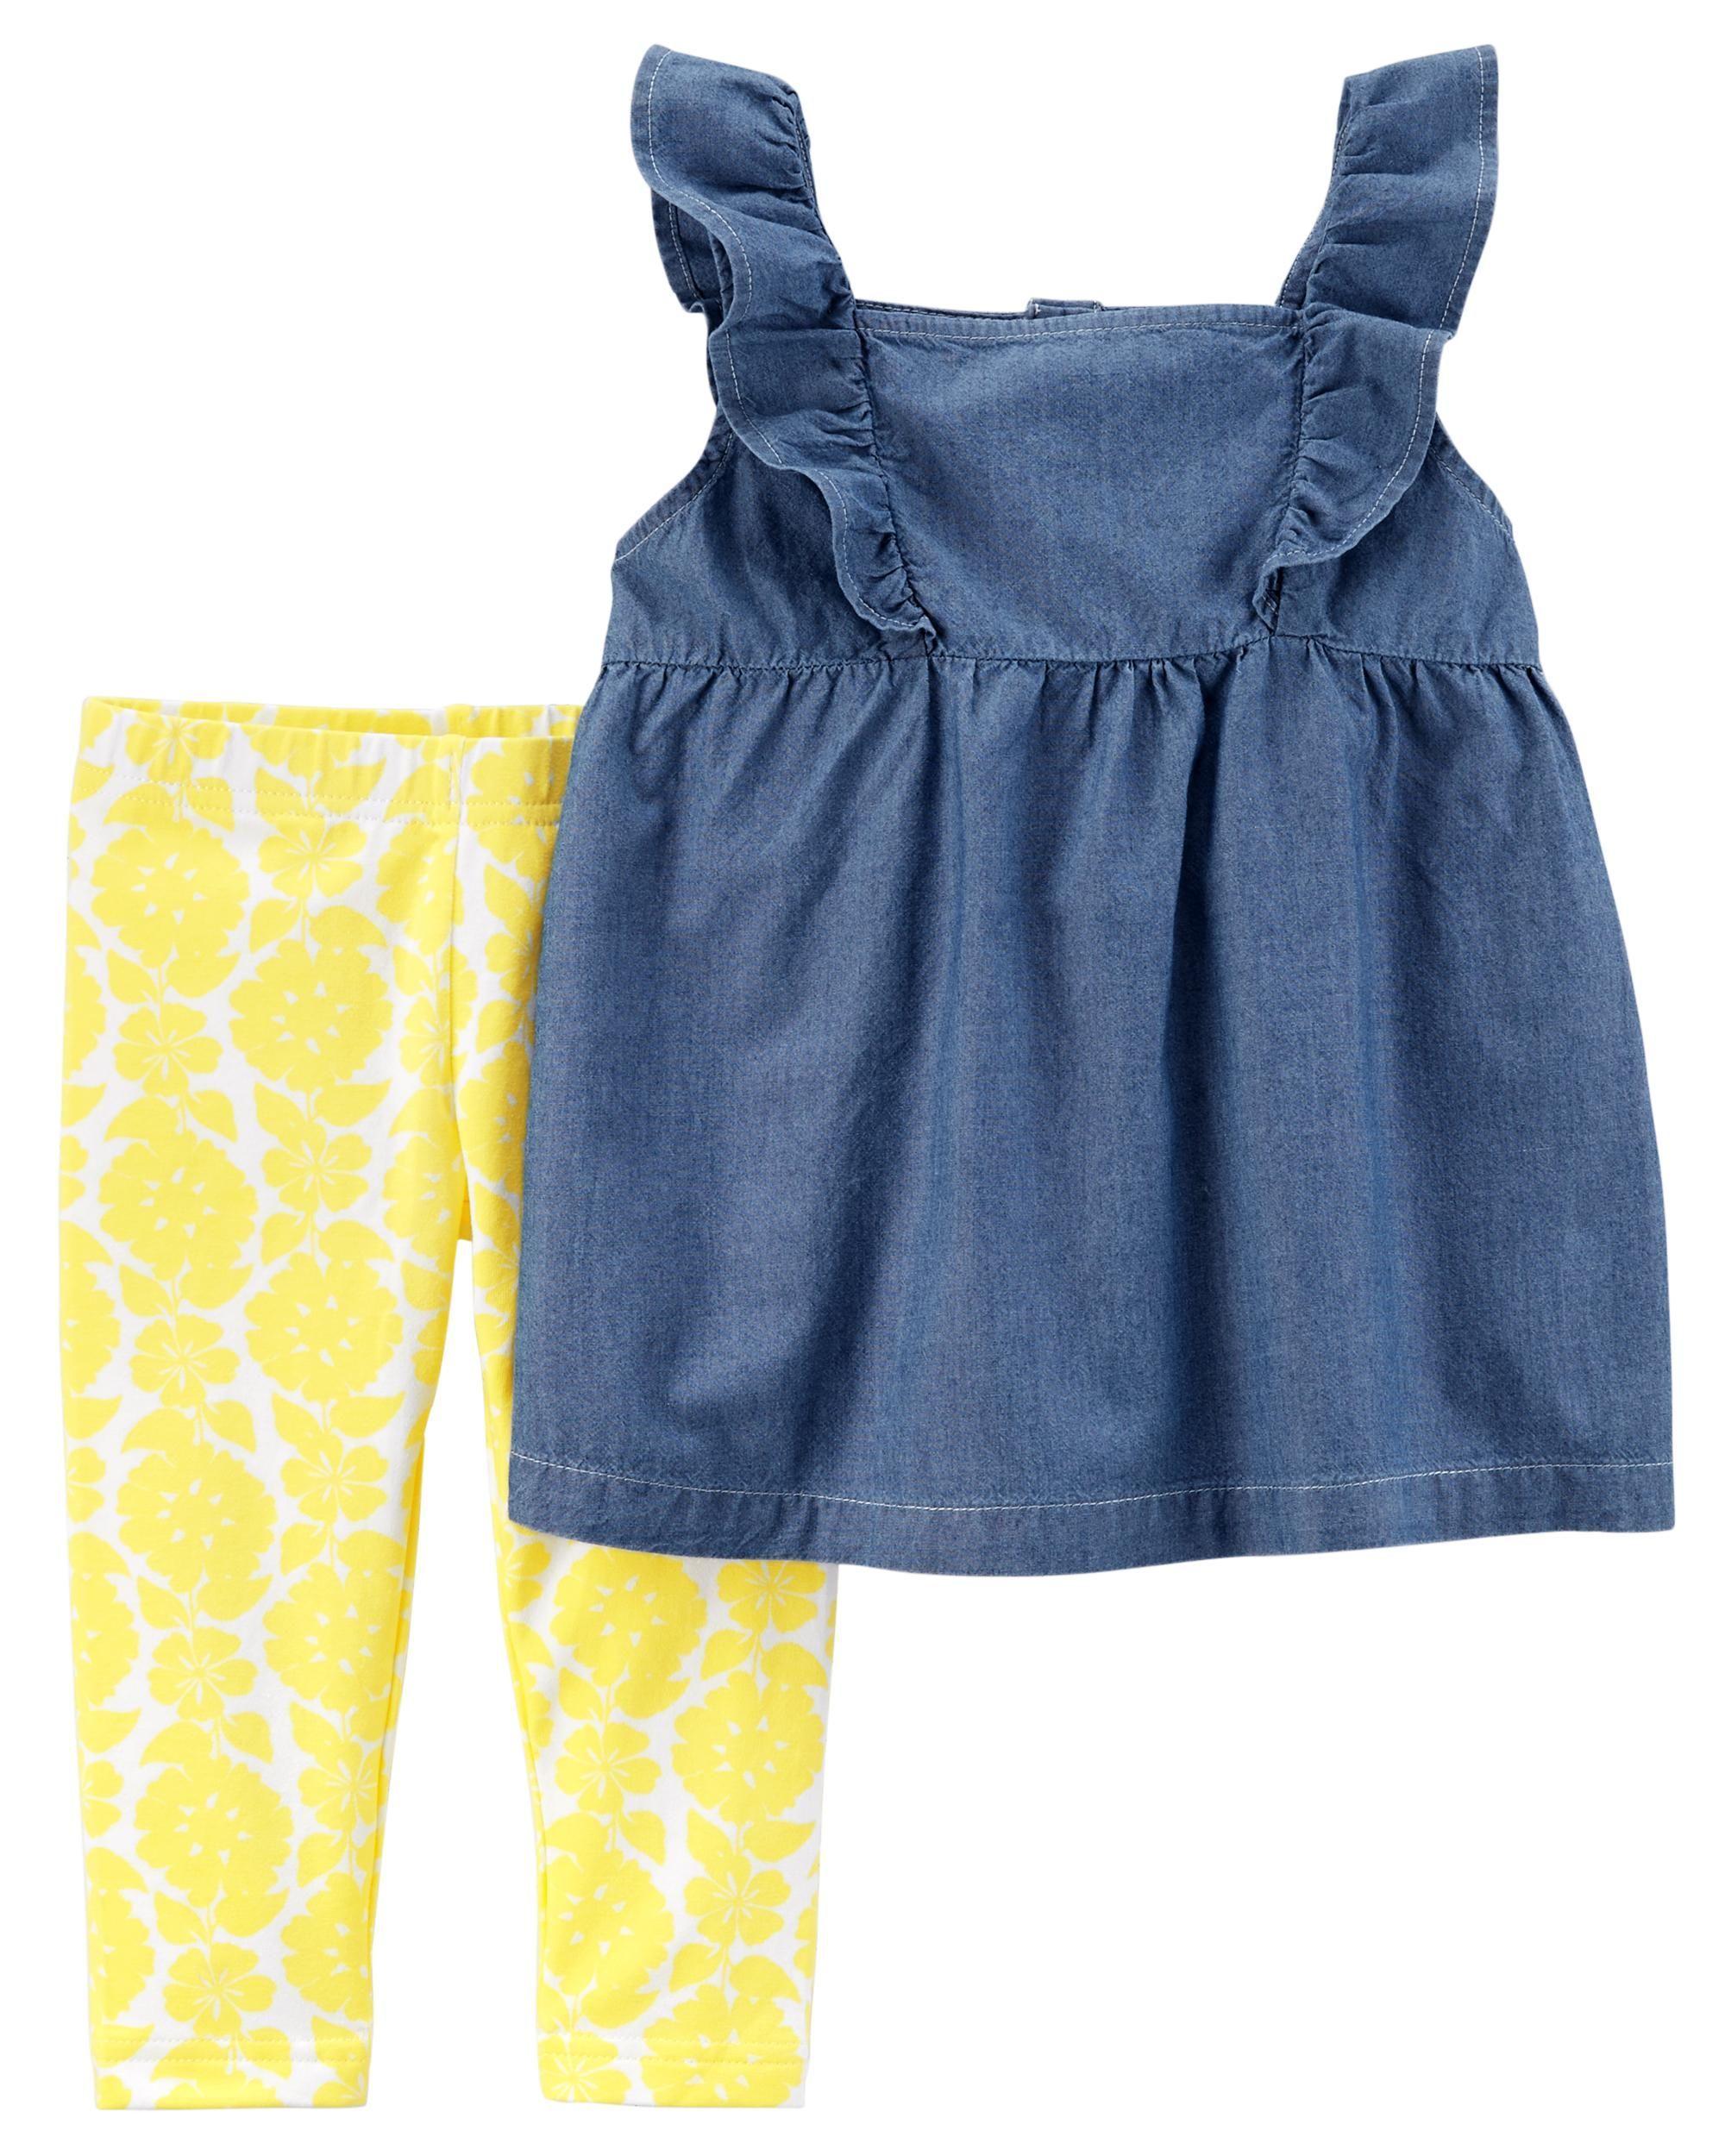 5f5eeb744c8 2-Piece Chambray Flutter Top & Floral Capri Legging Set   Lou Babe ...